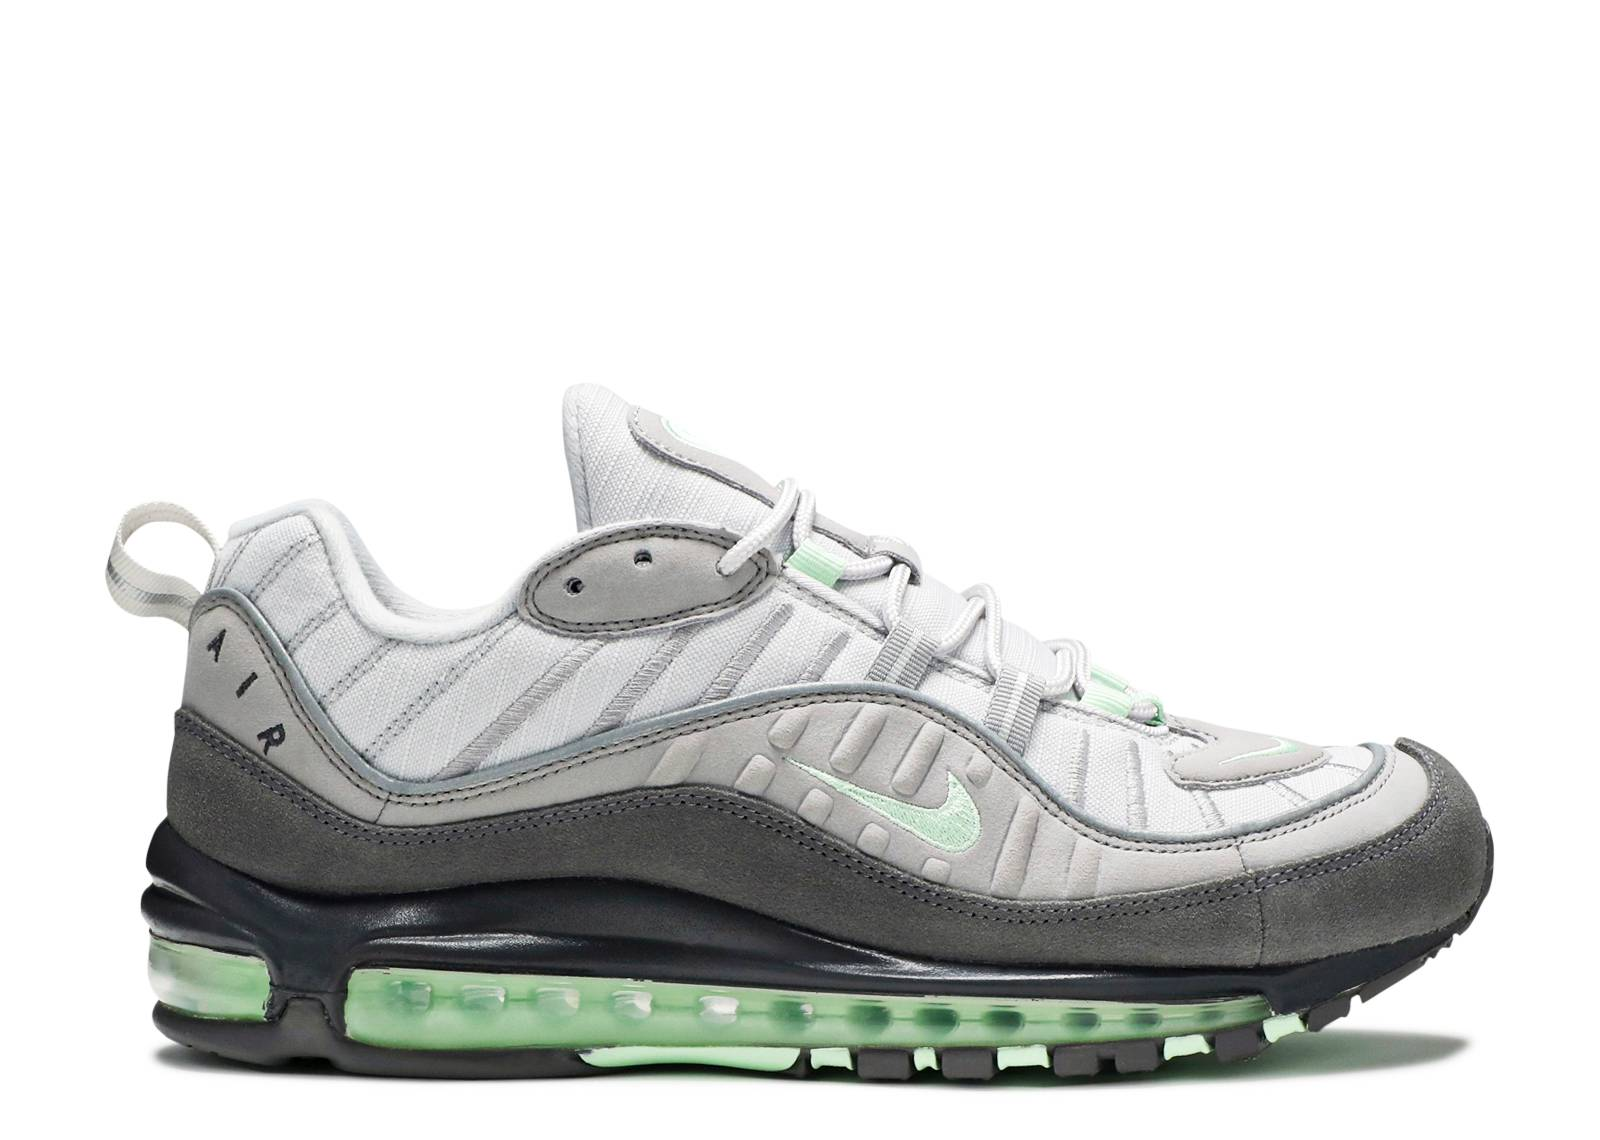 7fe13b7ec9 Nike Air Max 98 'Vast Grey Mint'